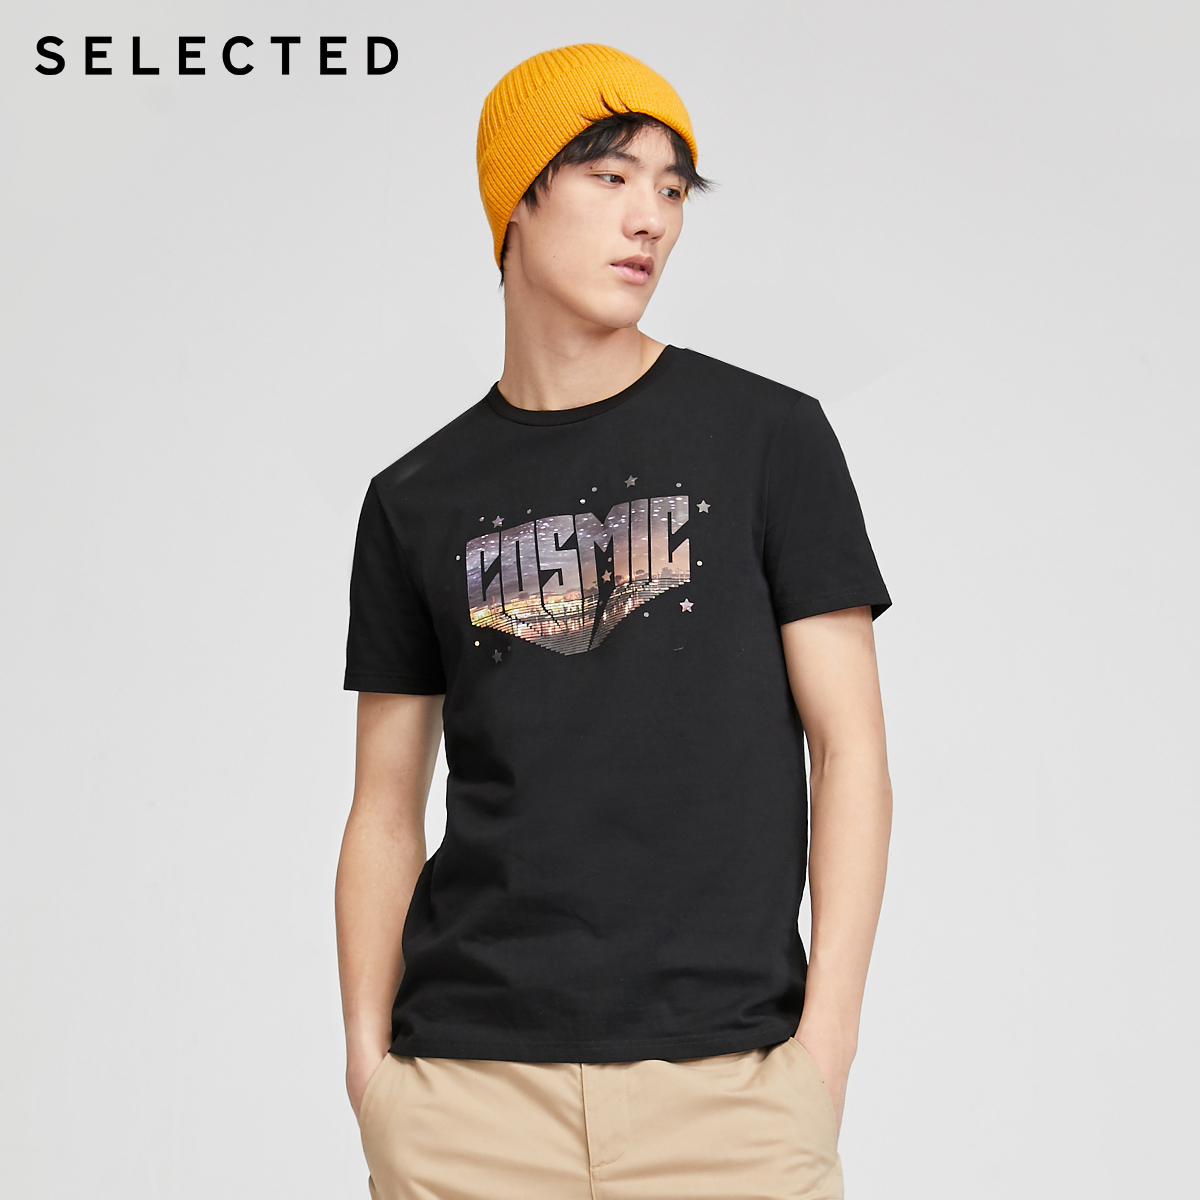 SELECTED Men's 100% Cotton Letter Print Short-sleeved T-shirt S|420201505